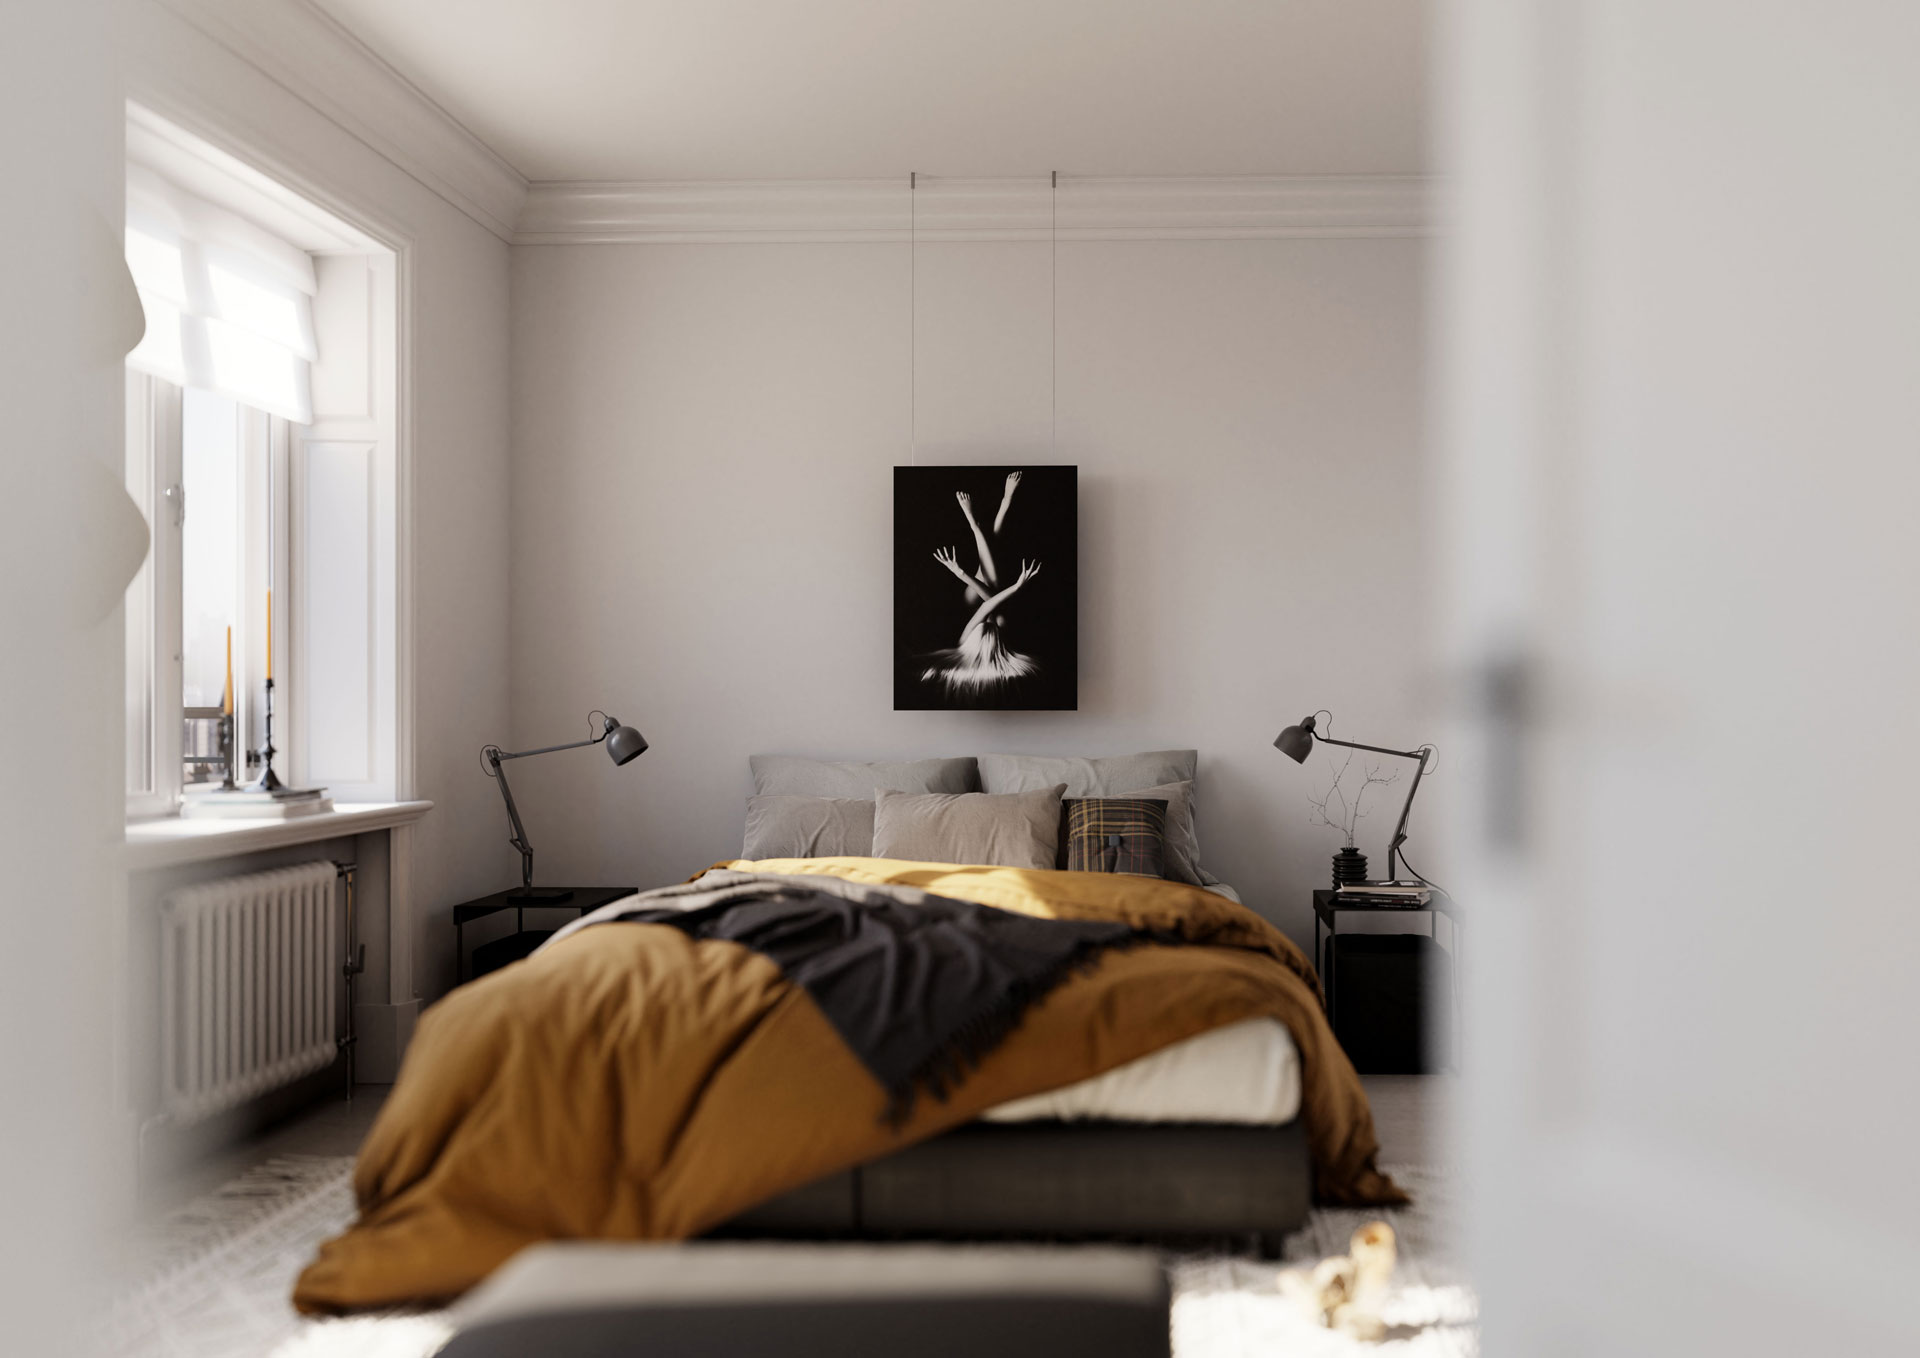 cgi images expose architecture property